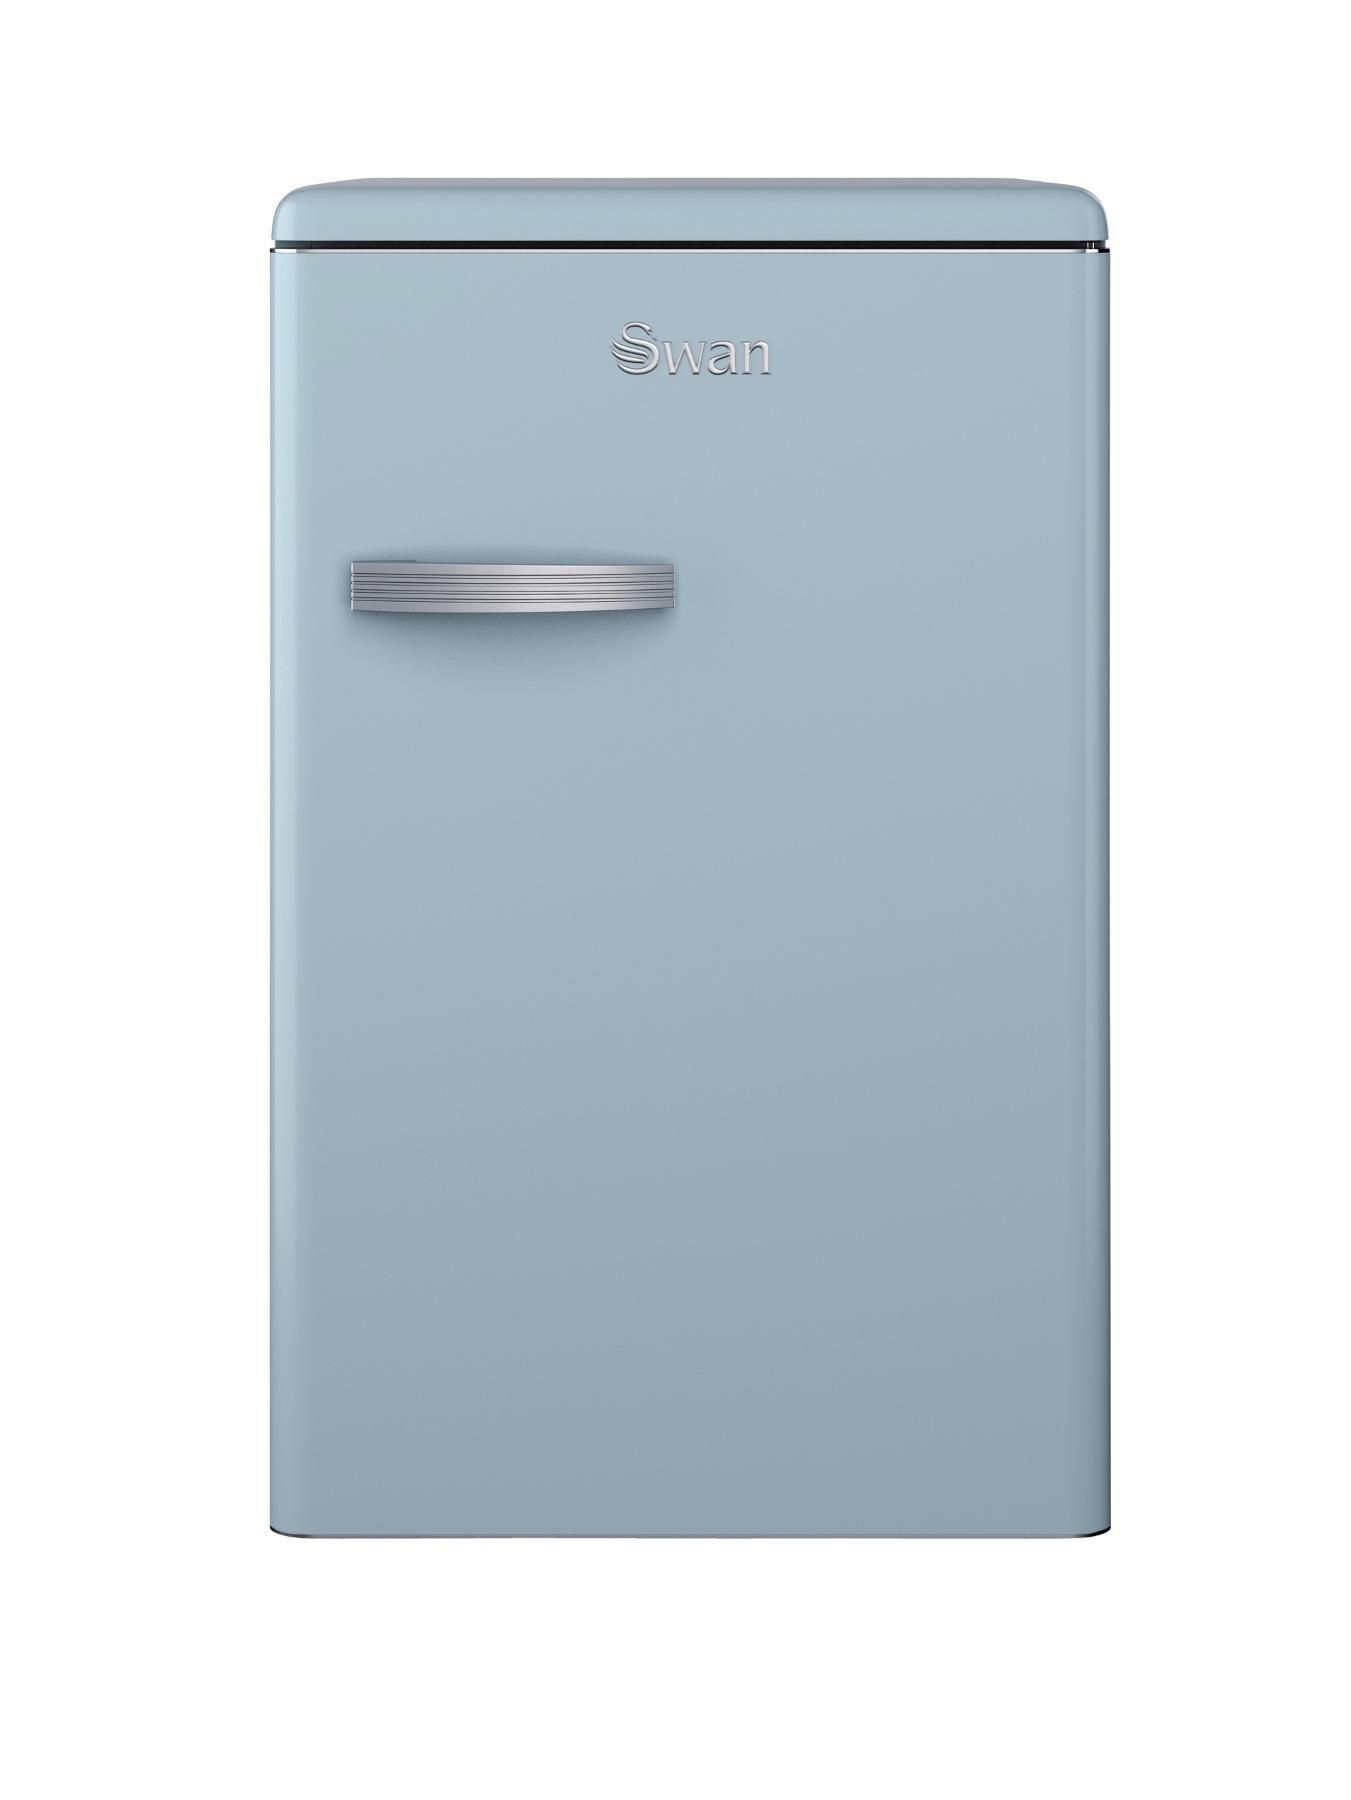 FFU4DX American Style 70cm Frost Free Fridge Freezer - Stainless ...